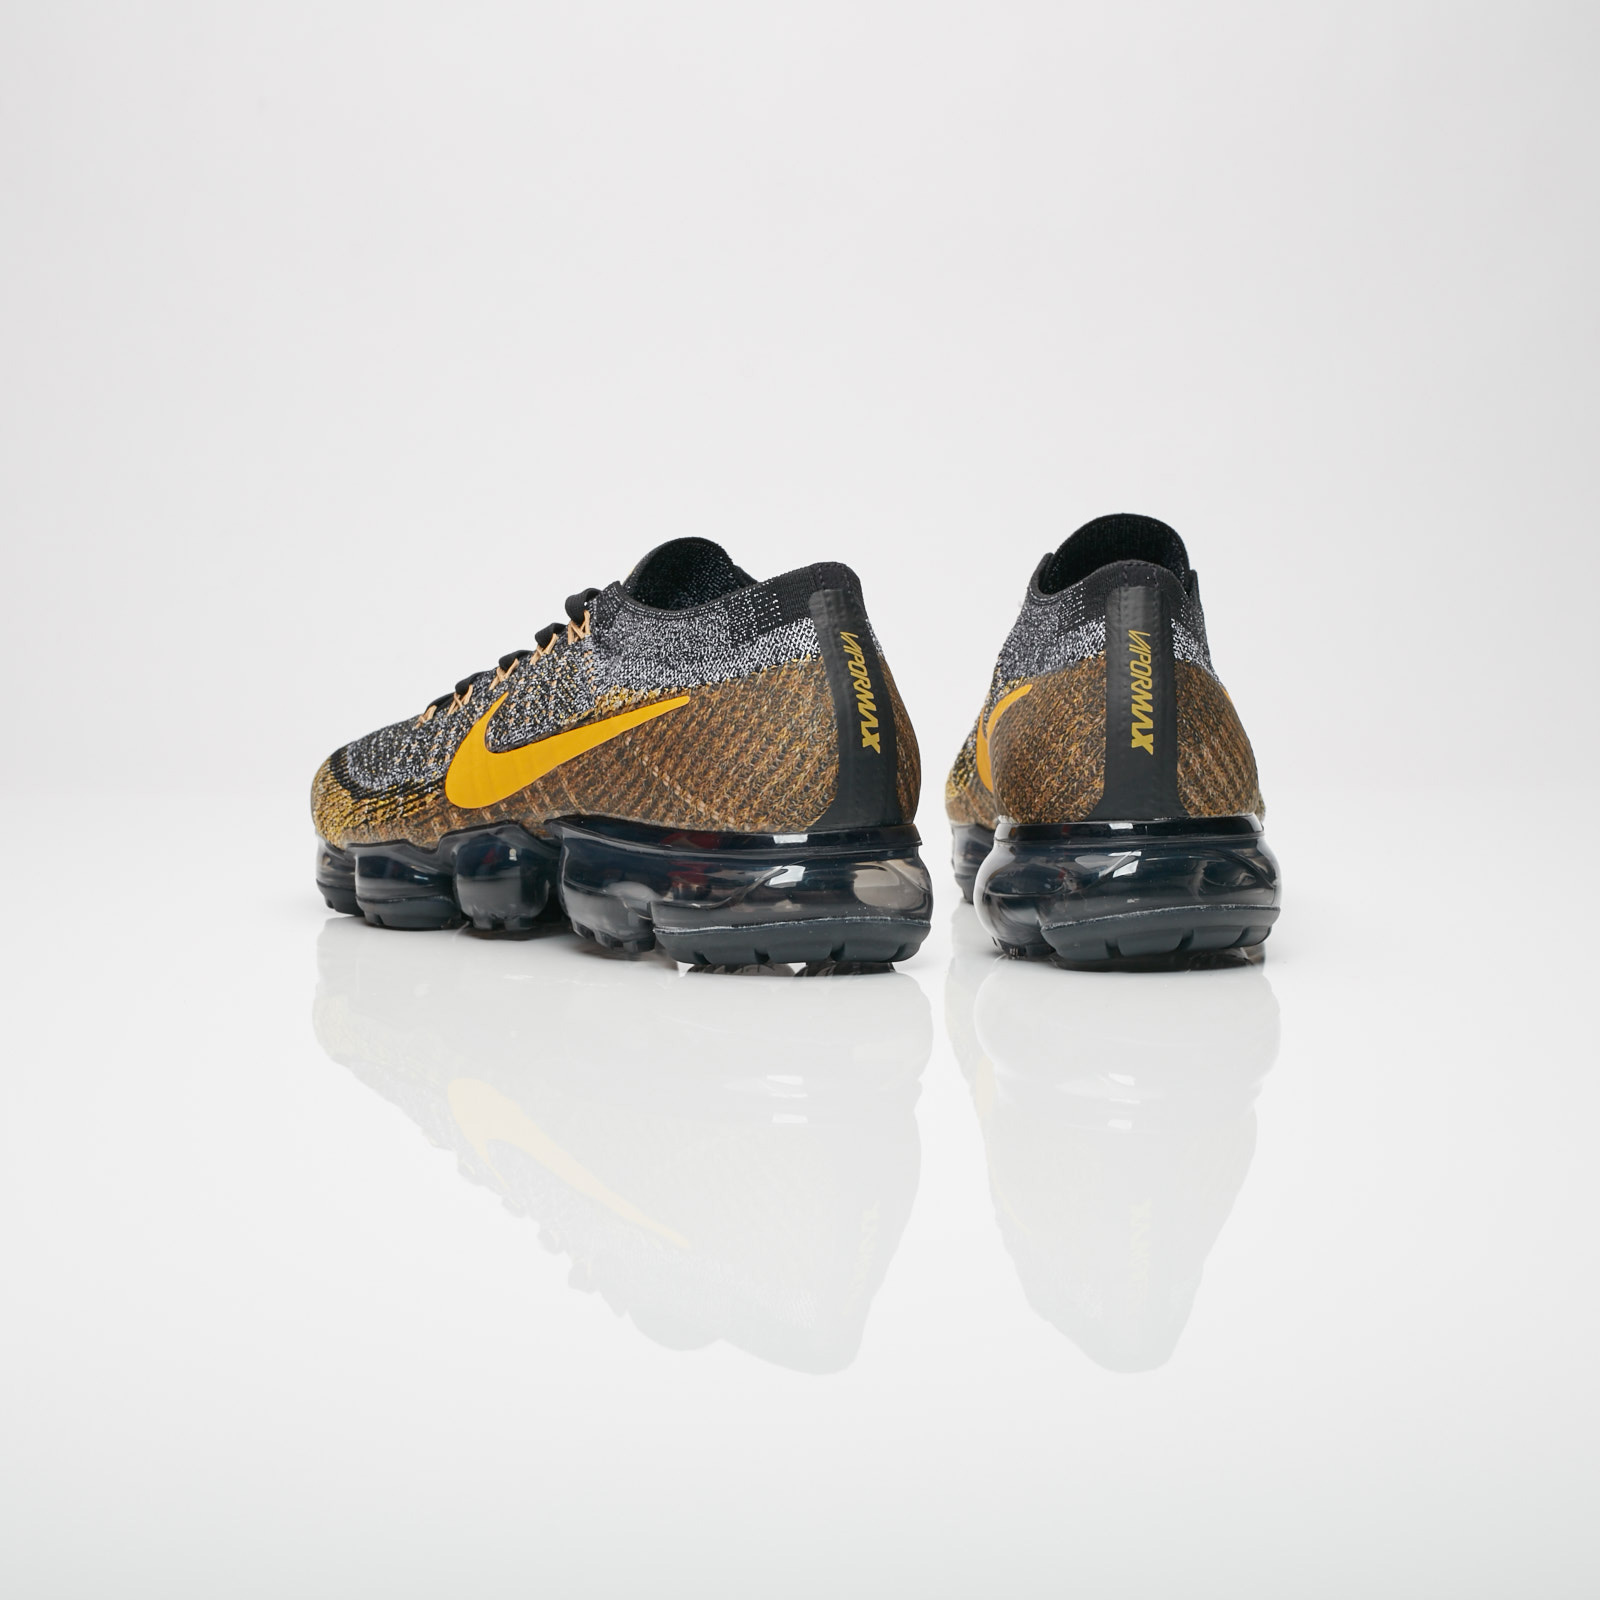 0bc3a89418820 Nike Air Vapormax Flyknit - 849558-021 - Sneakersnstuff